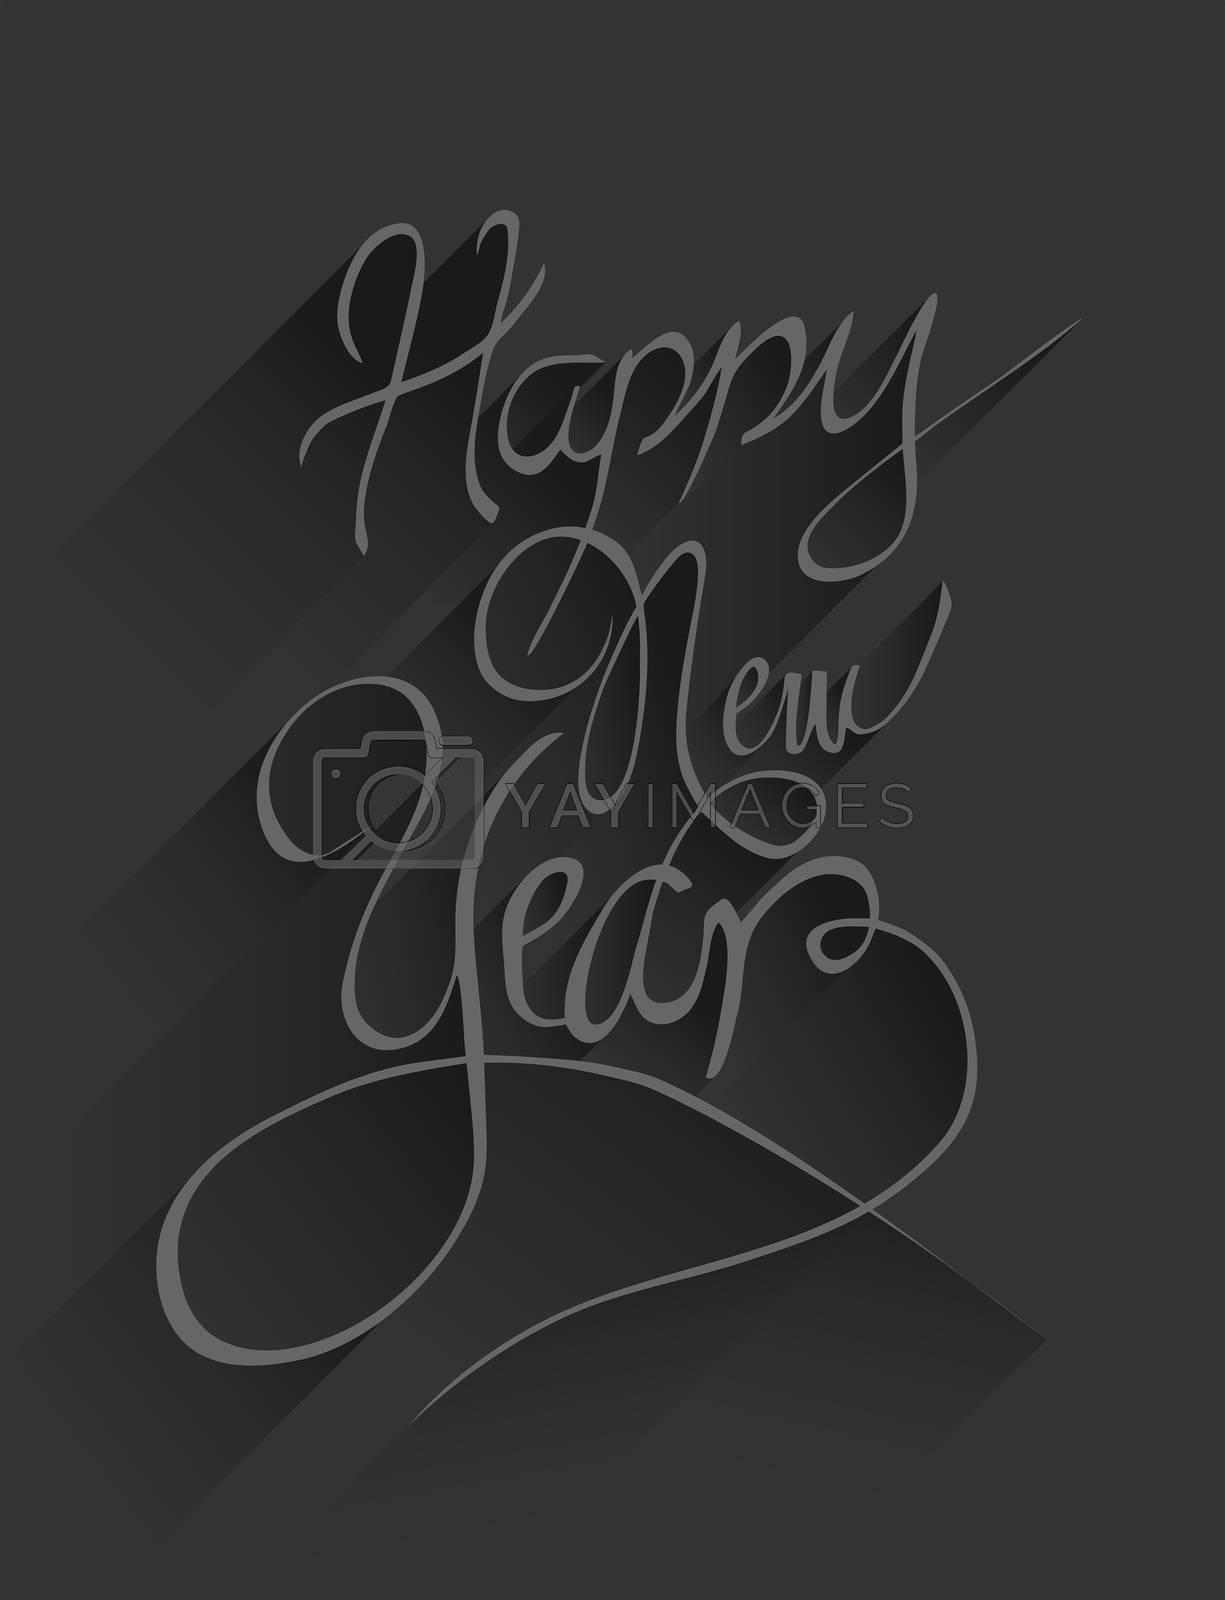 Digitally generated Happy new year vector in embossed black